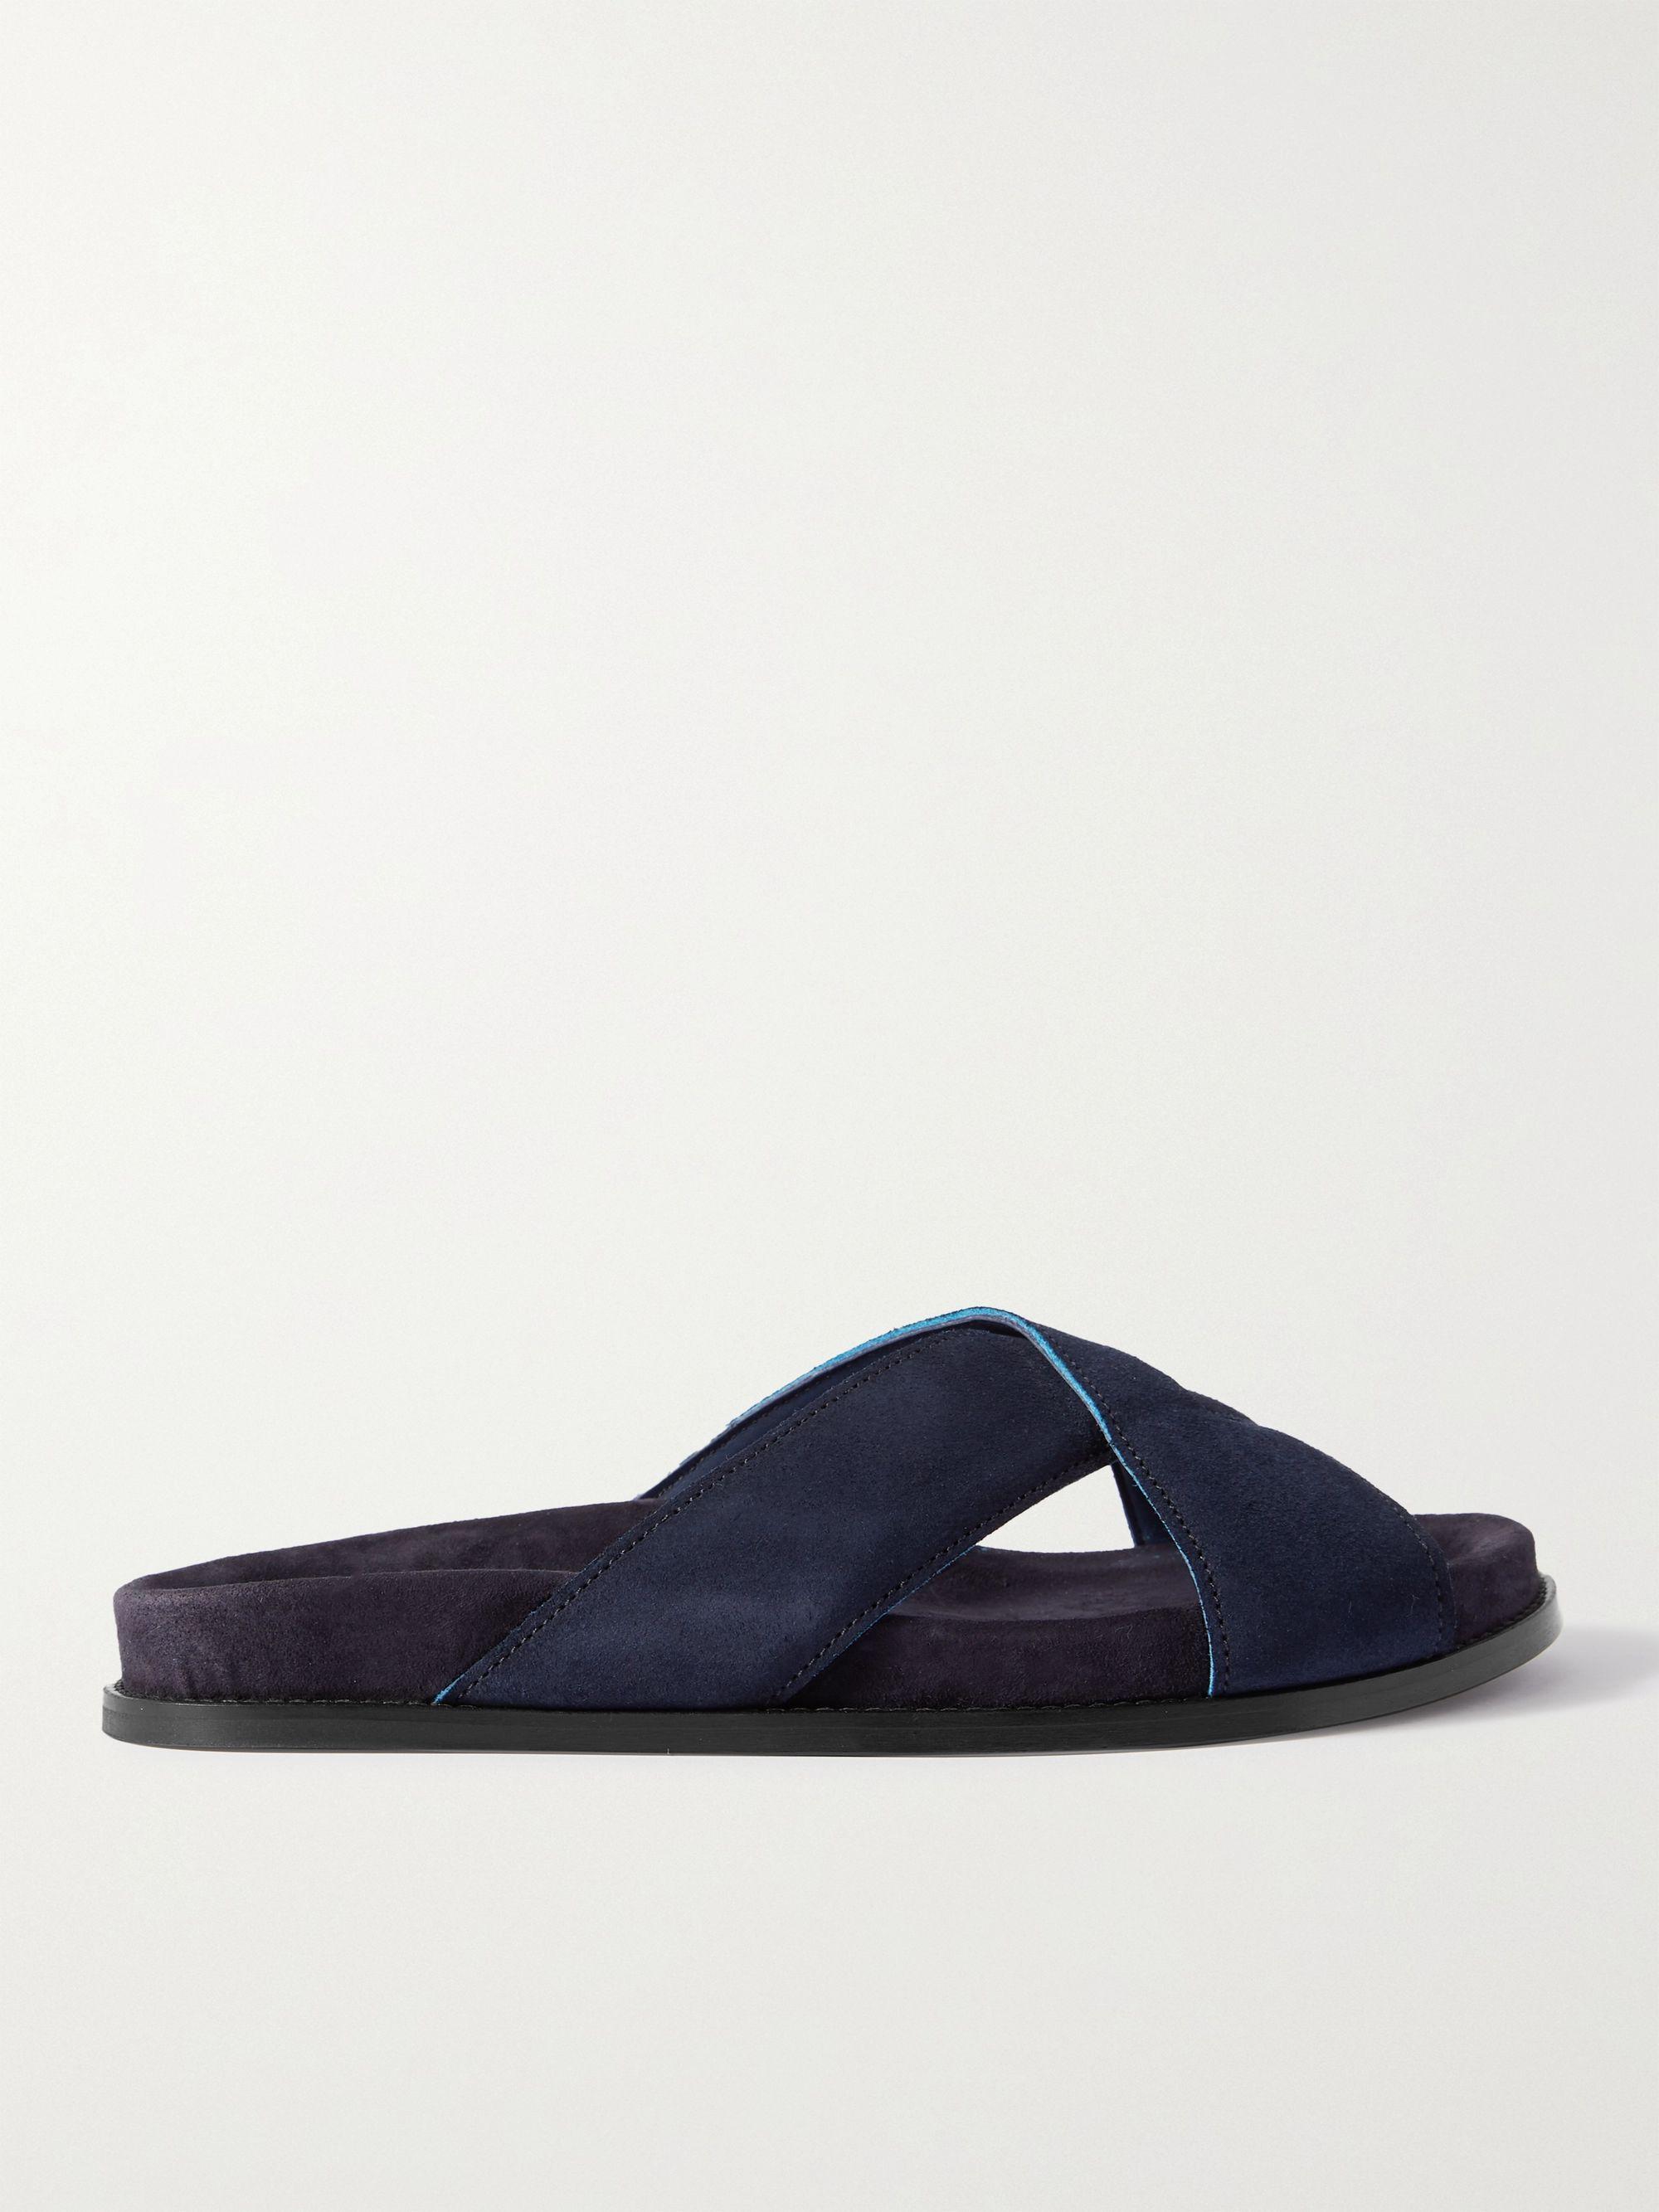 MR P. David Suede Sandals,Blue